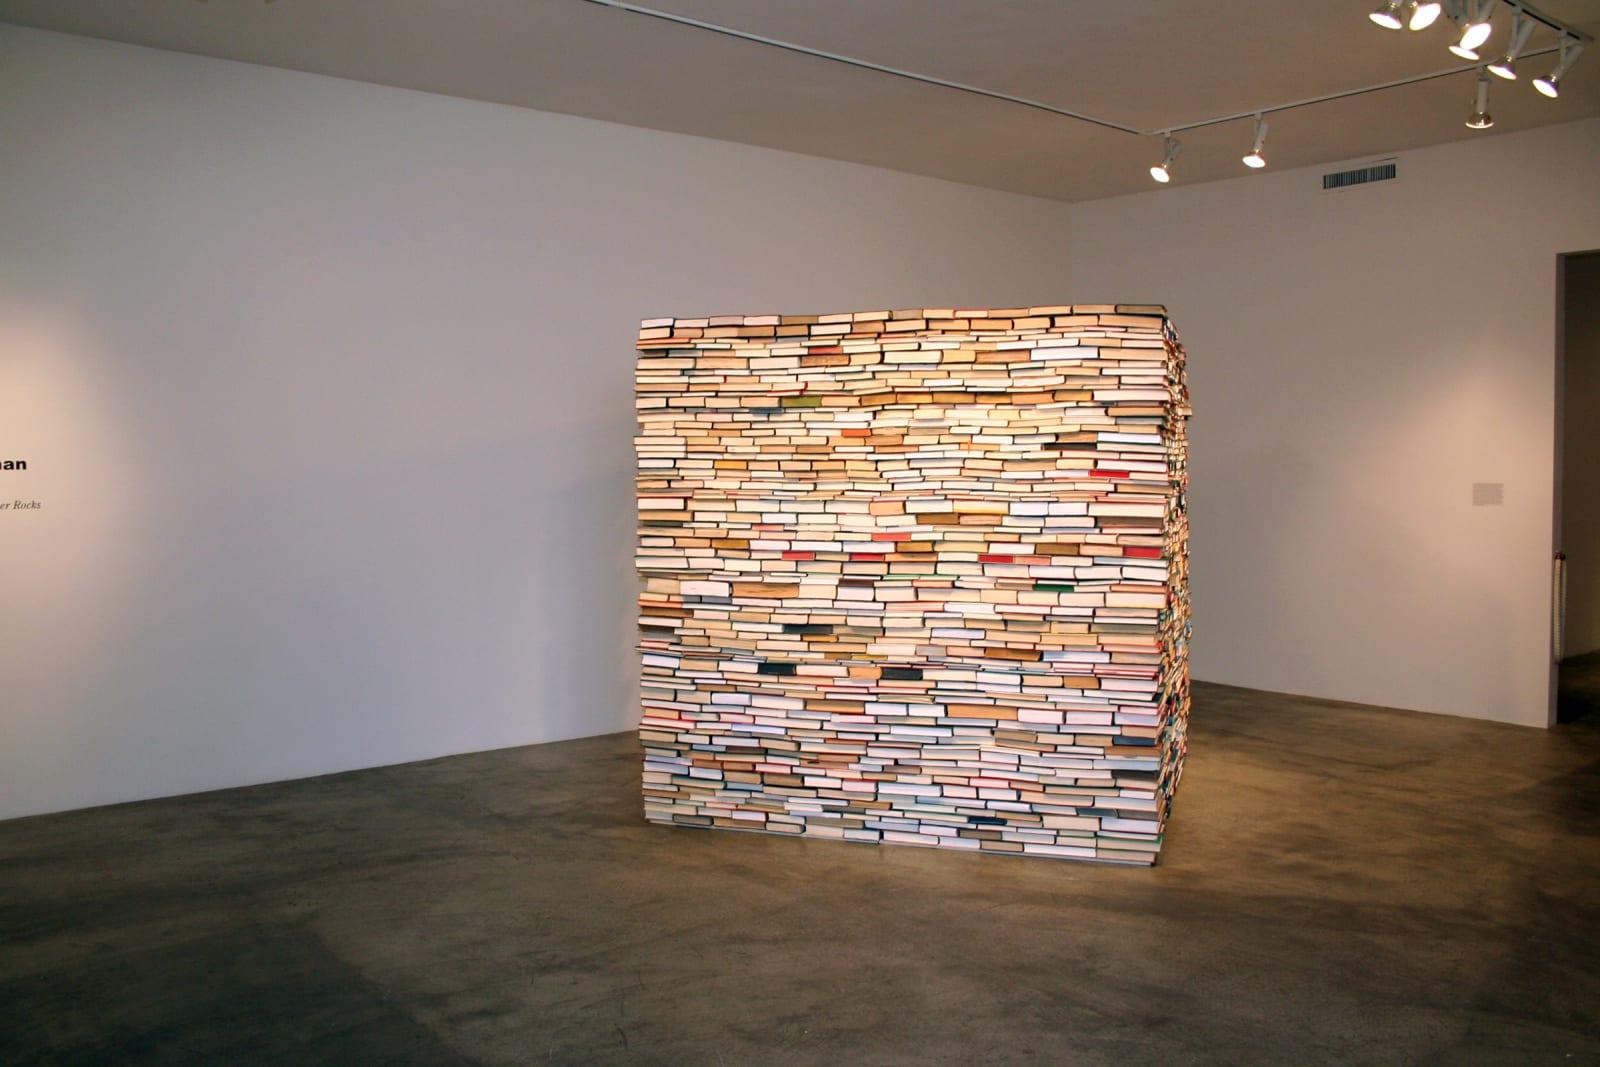 Aaron T Stephan | Building Houses/Hiding Under Rocks